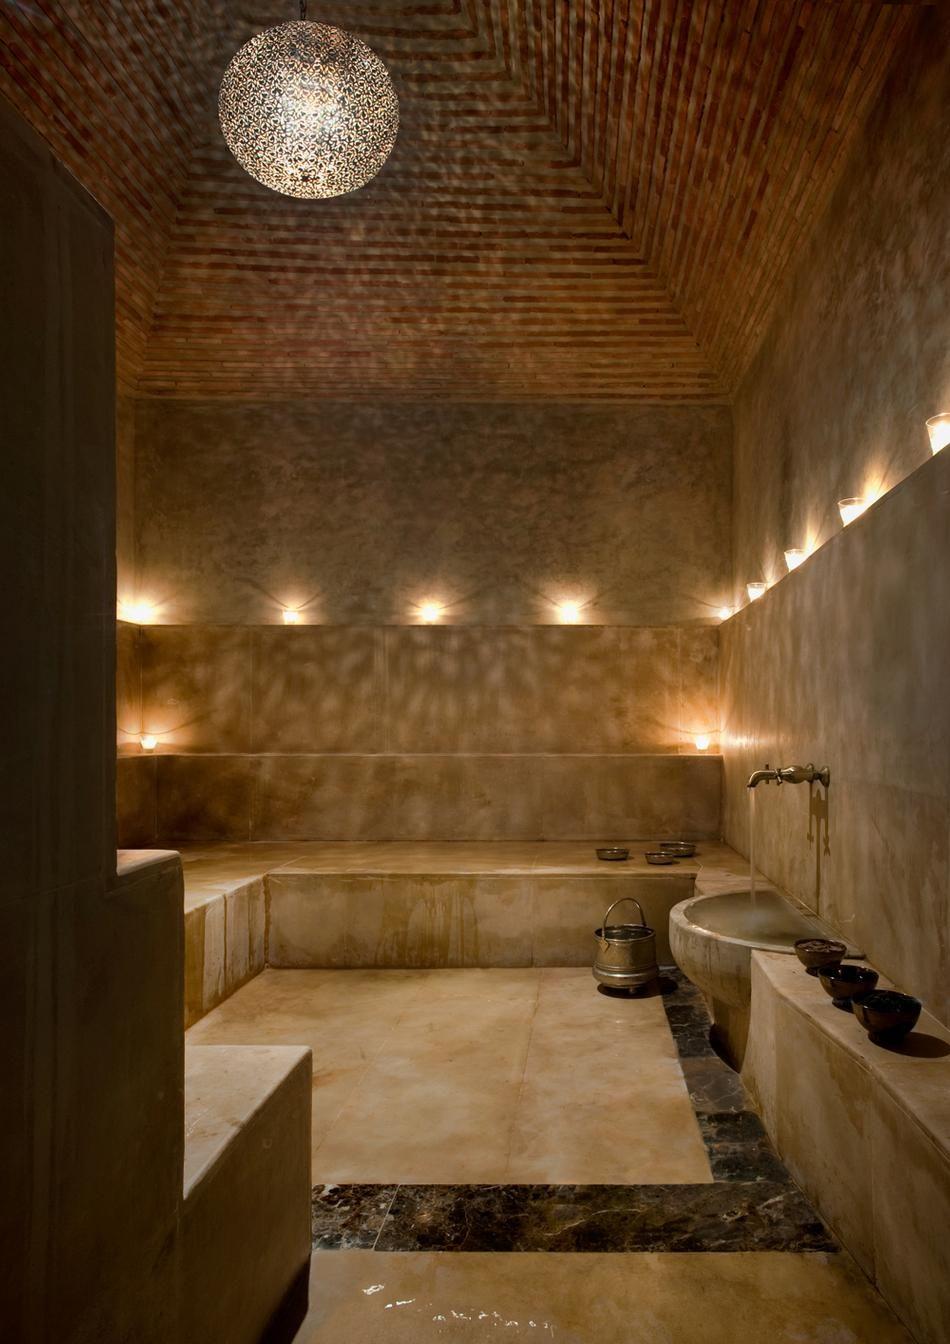 Pampering In Marrakech Spa Rooms Steam Room Luxury Bathroom